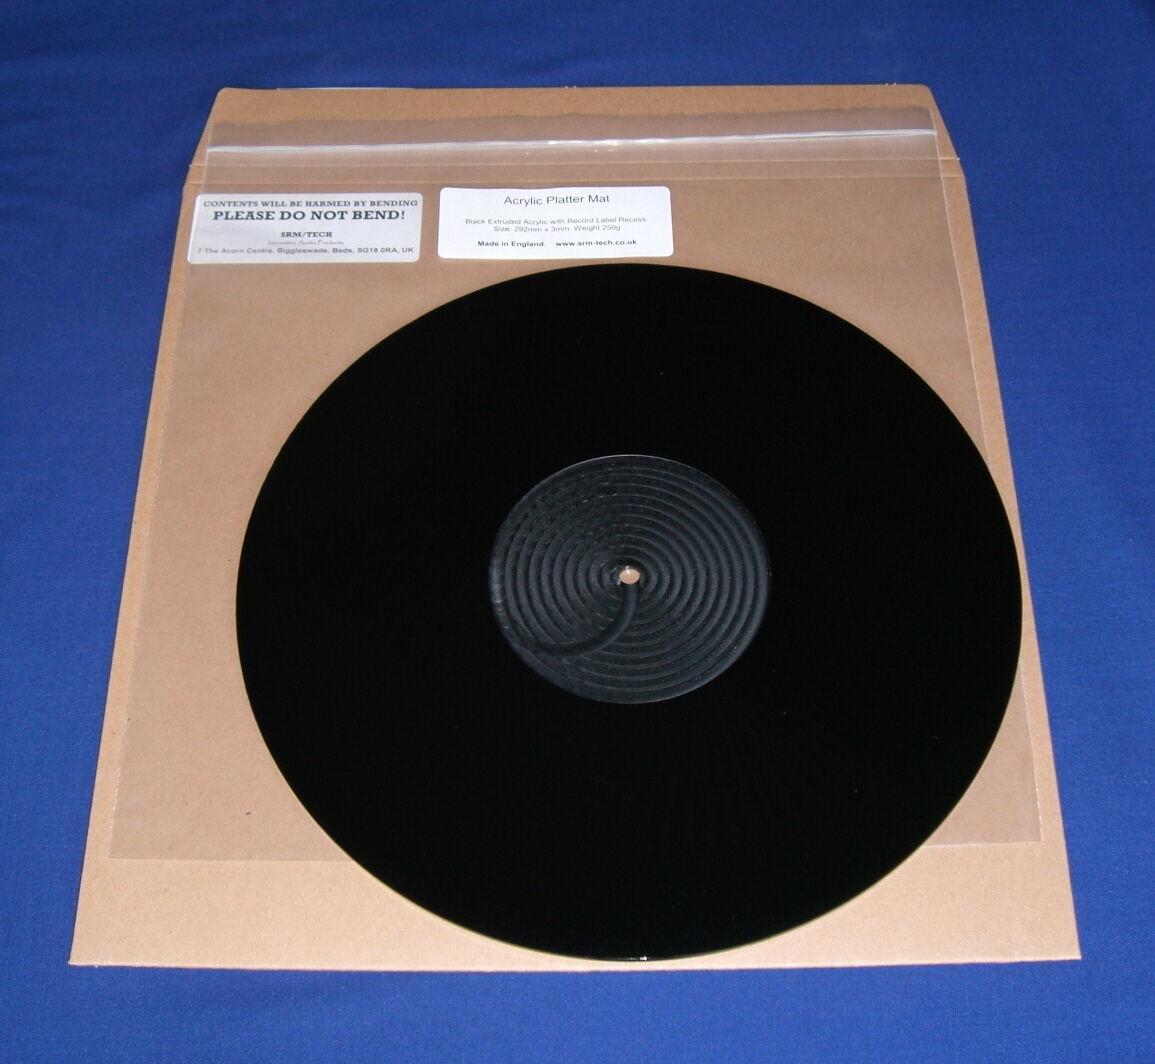 SRM TECH ACRYLIC TURNTABLE PLATTER MAT FOR TECHNICS SL1200 SL1210 - ALL VARIANTS